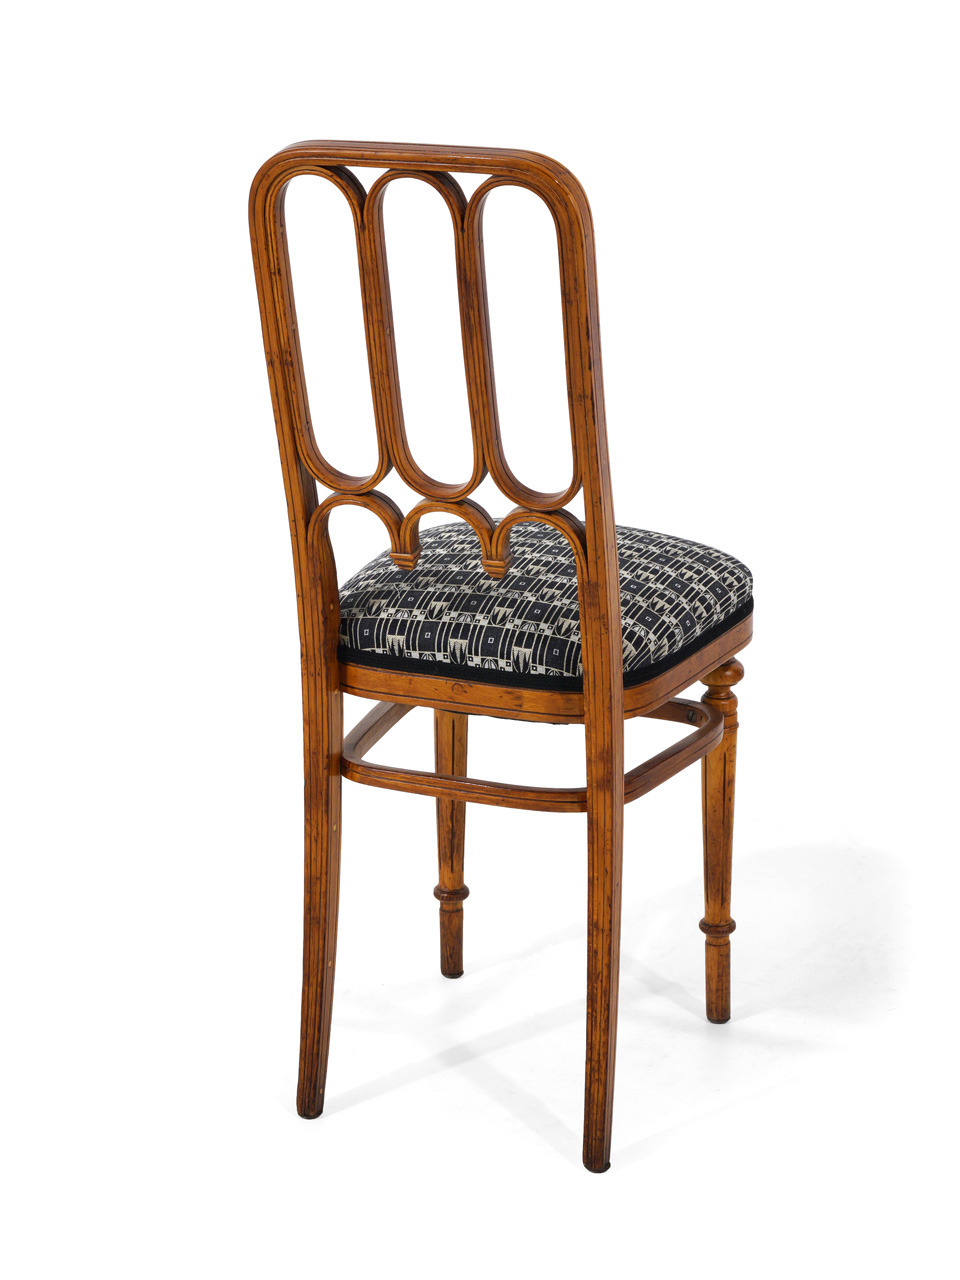 art nr 569 polsterstuhl firma thonet um 1900 antiquit ten am markt t bingen. Black Bedroom Furniture Sets. Home Design Ideas